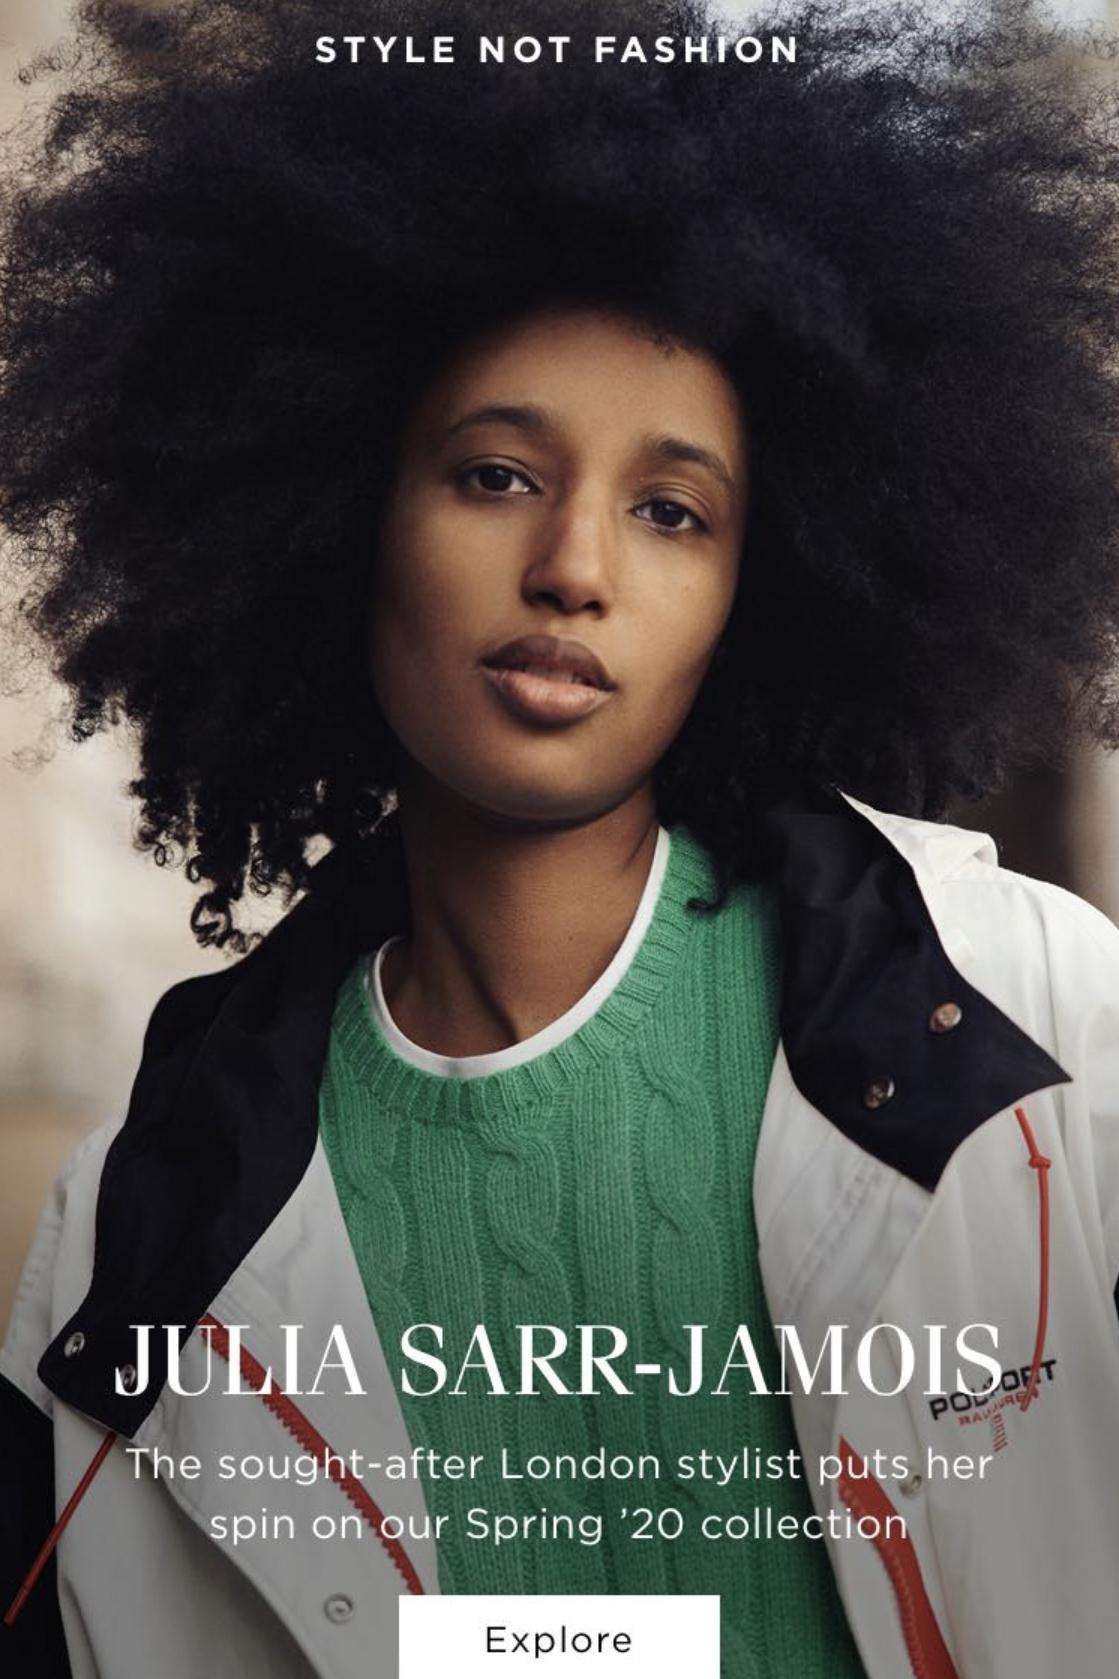 Julia Sarr-Jamois for Polo Ralph Lauren